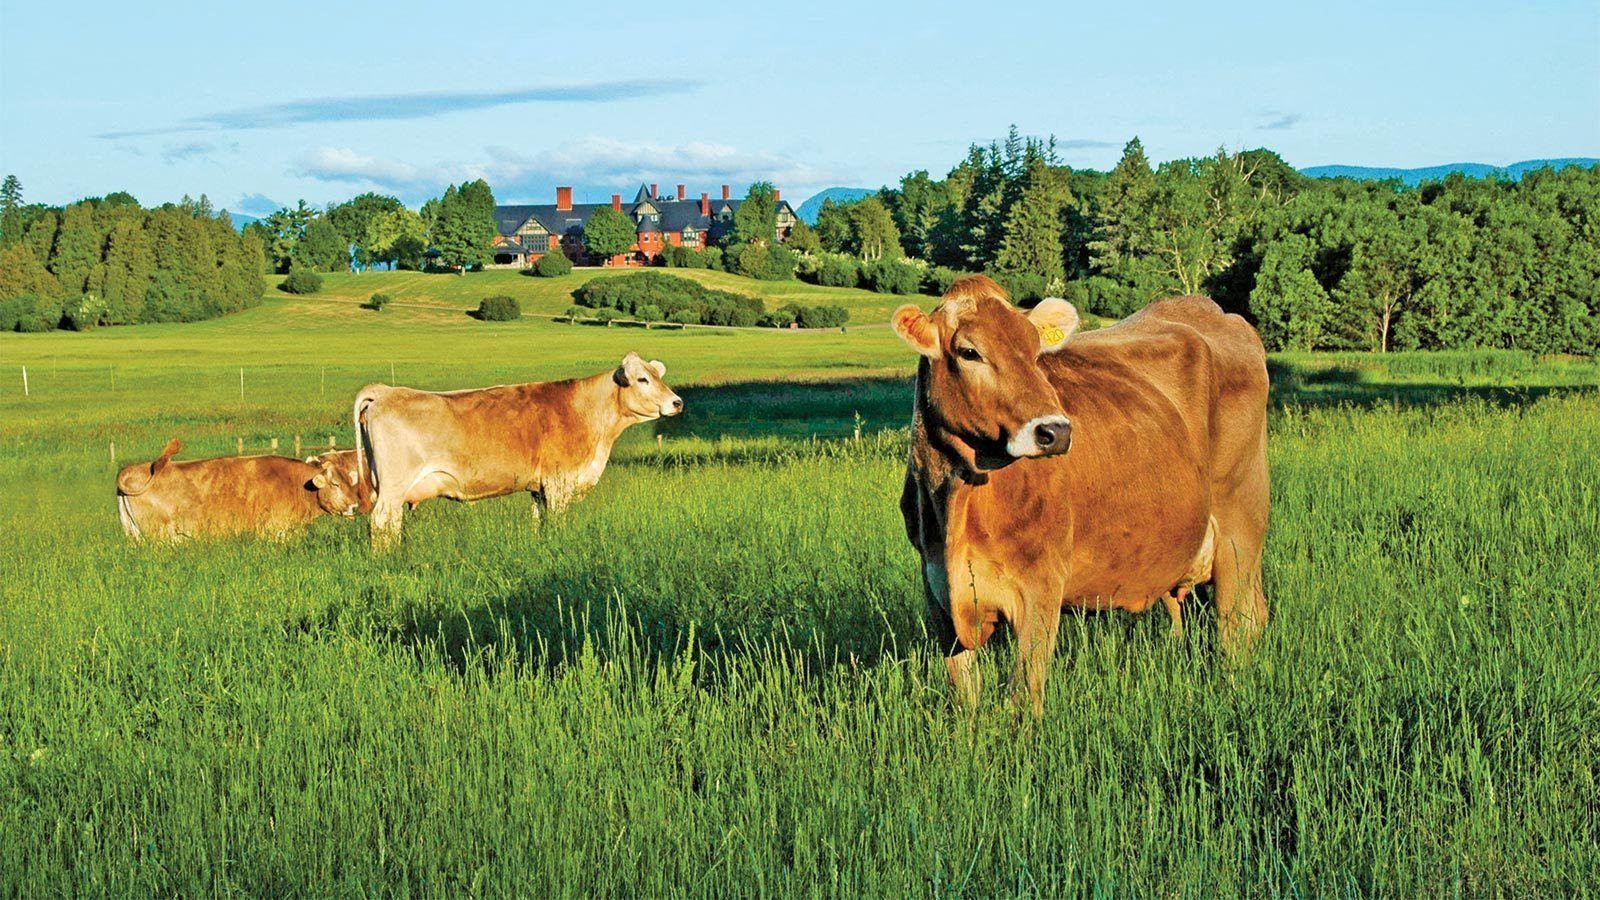 Vermont Champlain Wishes Shelburne farms, Vermont, New